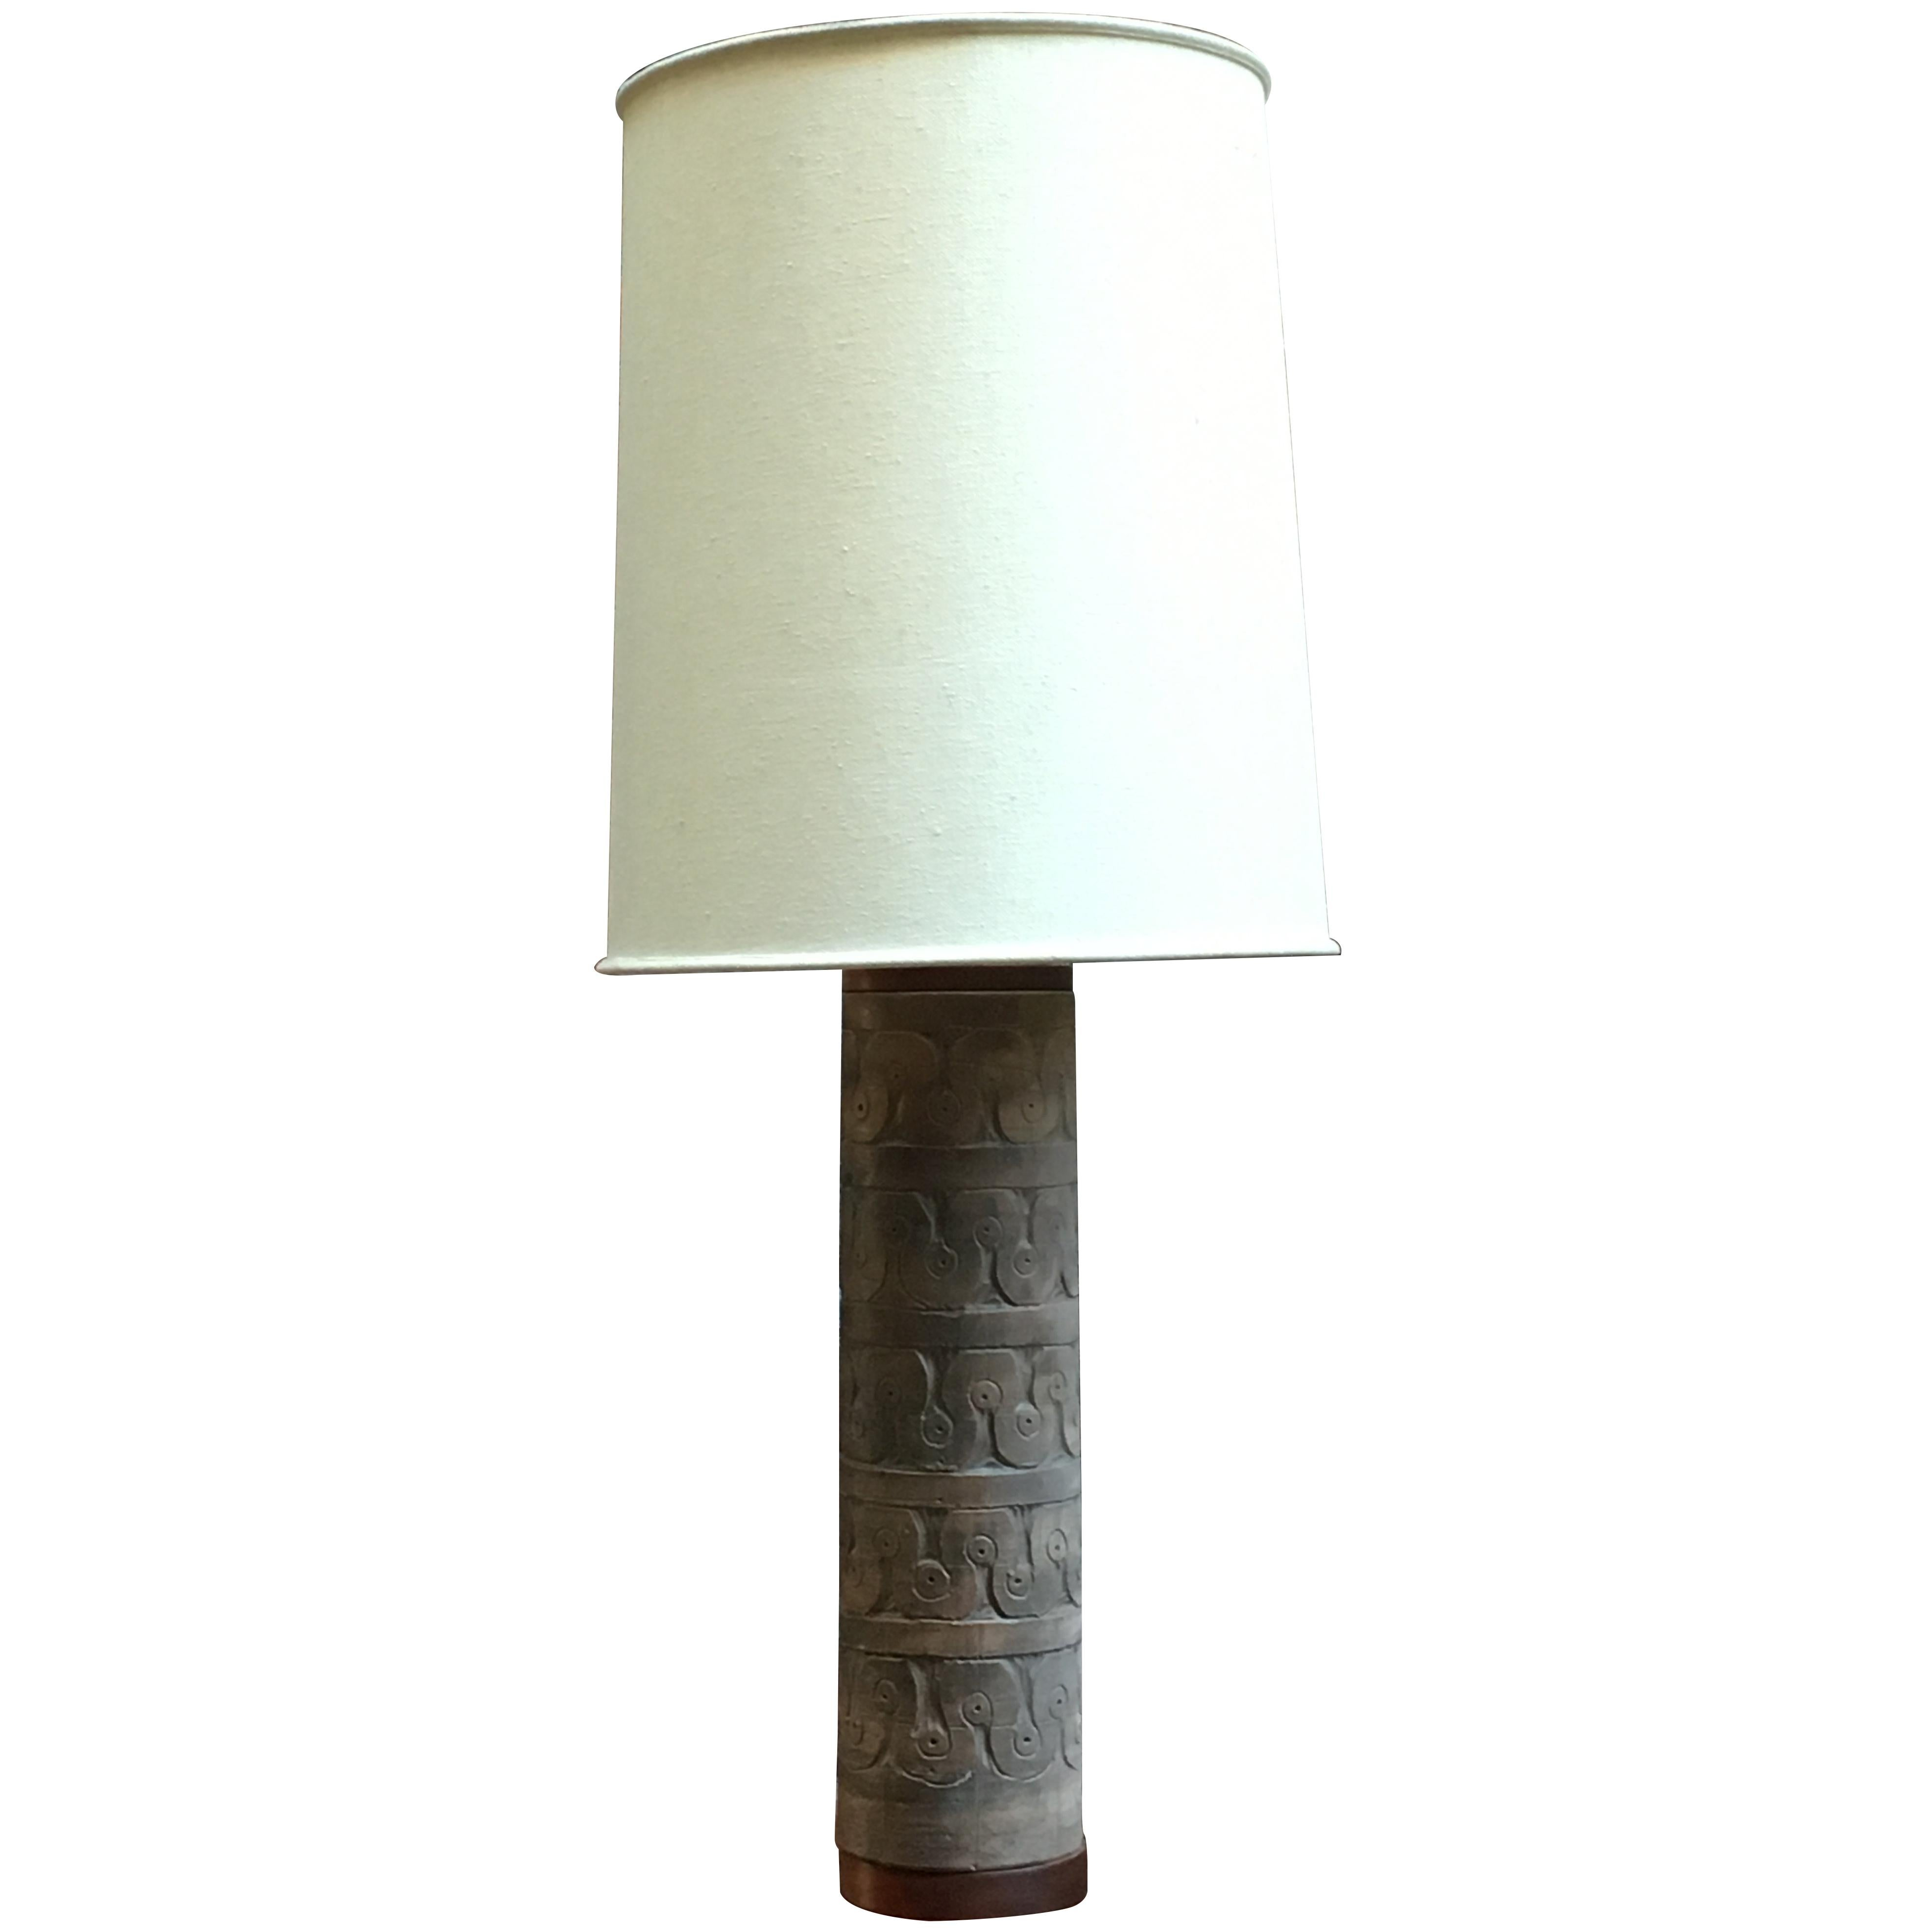 TIC for Raymor Italian Pottery Lamp